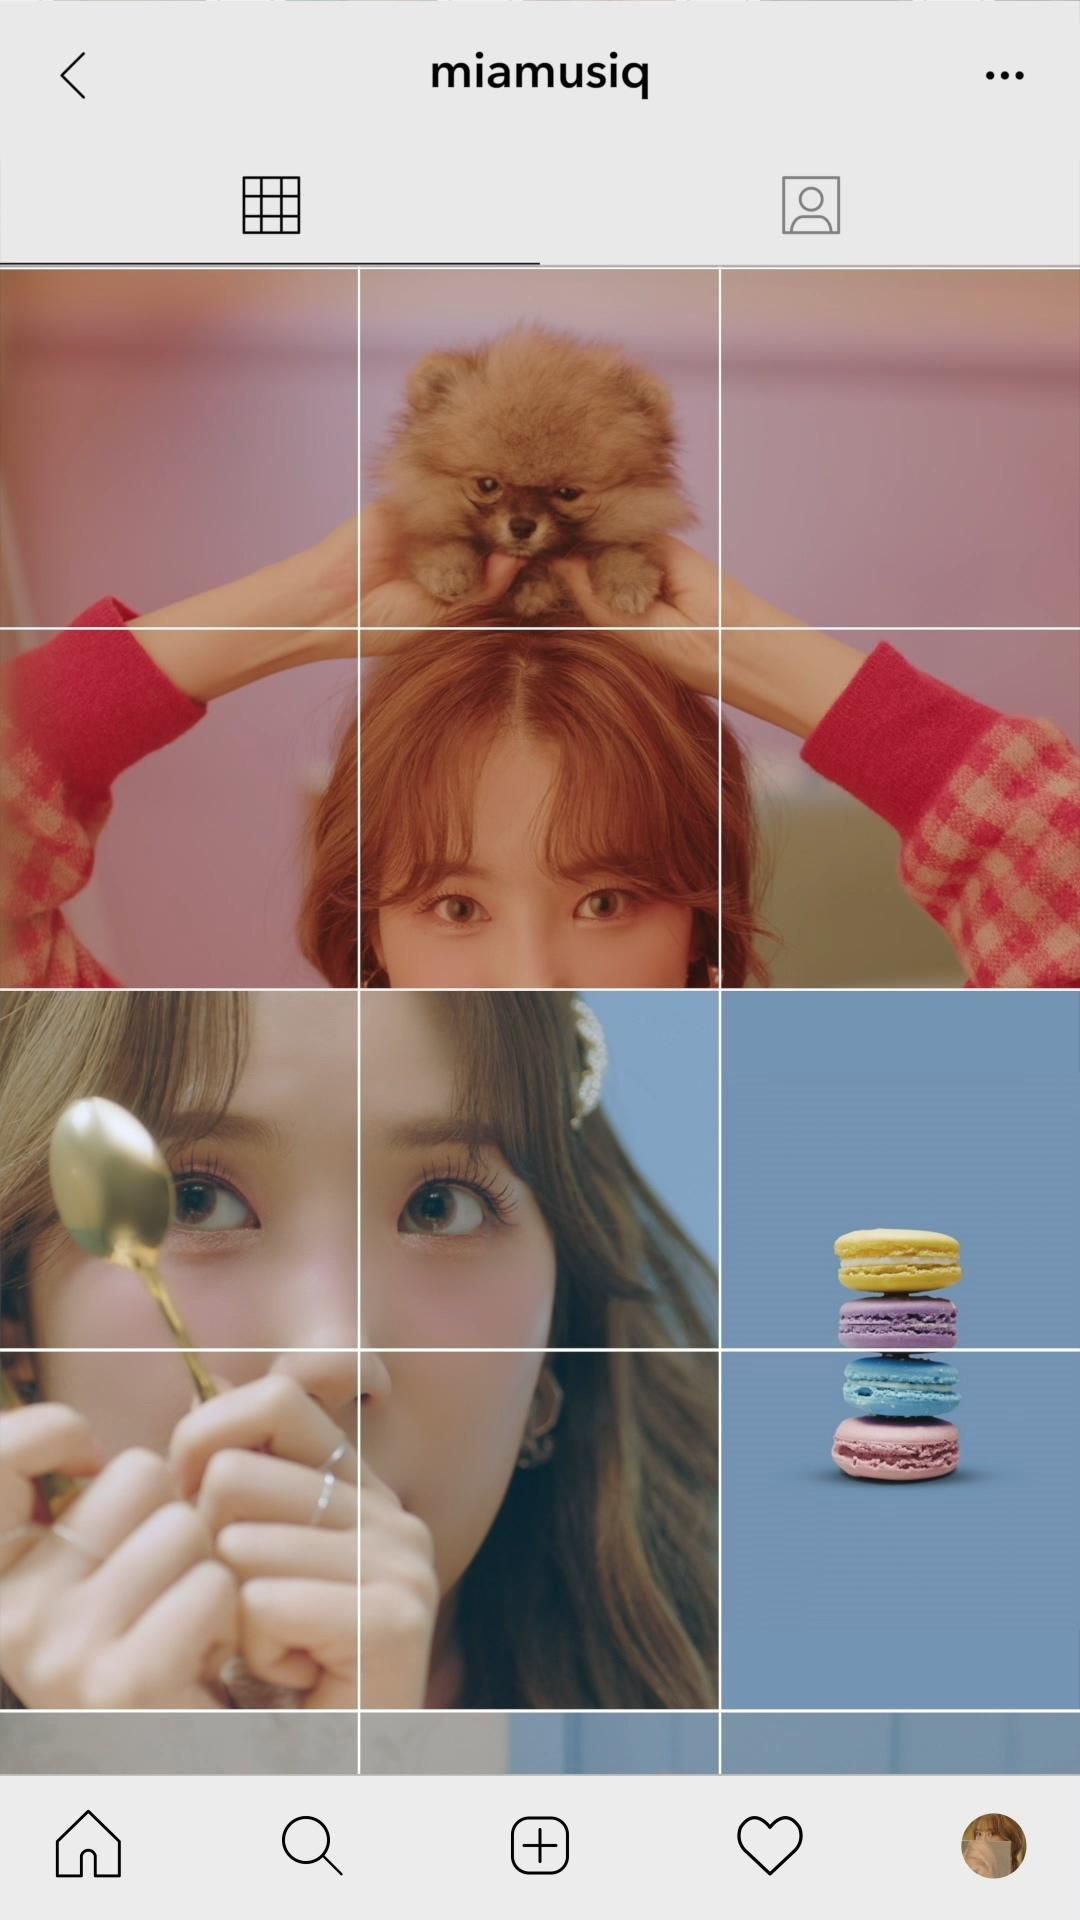 [MV] 미아(Mia) - Insta lover